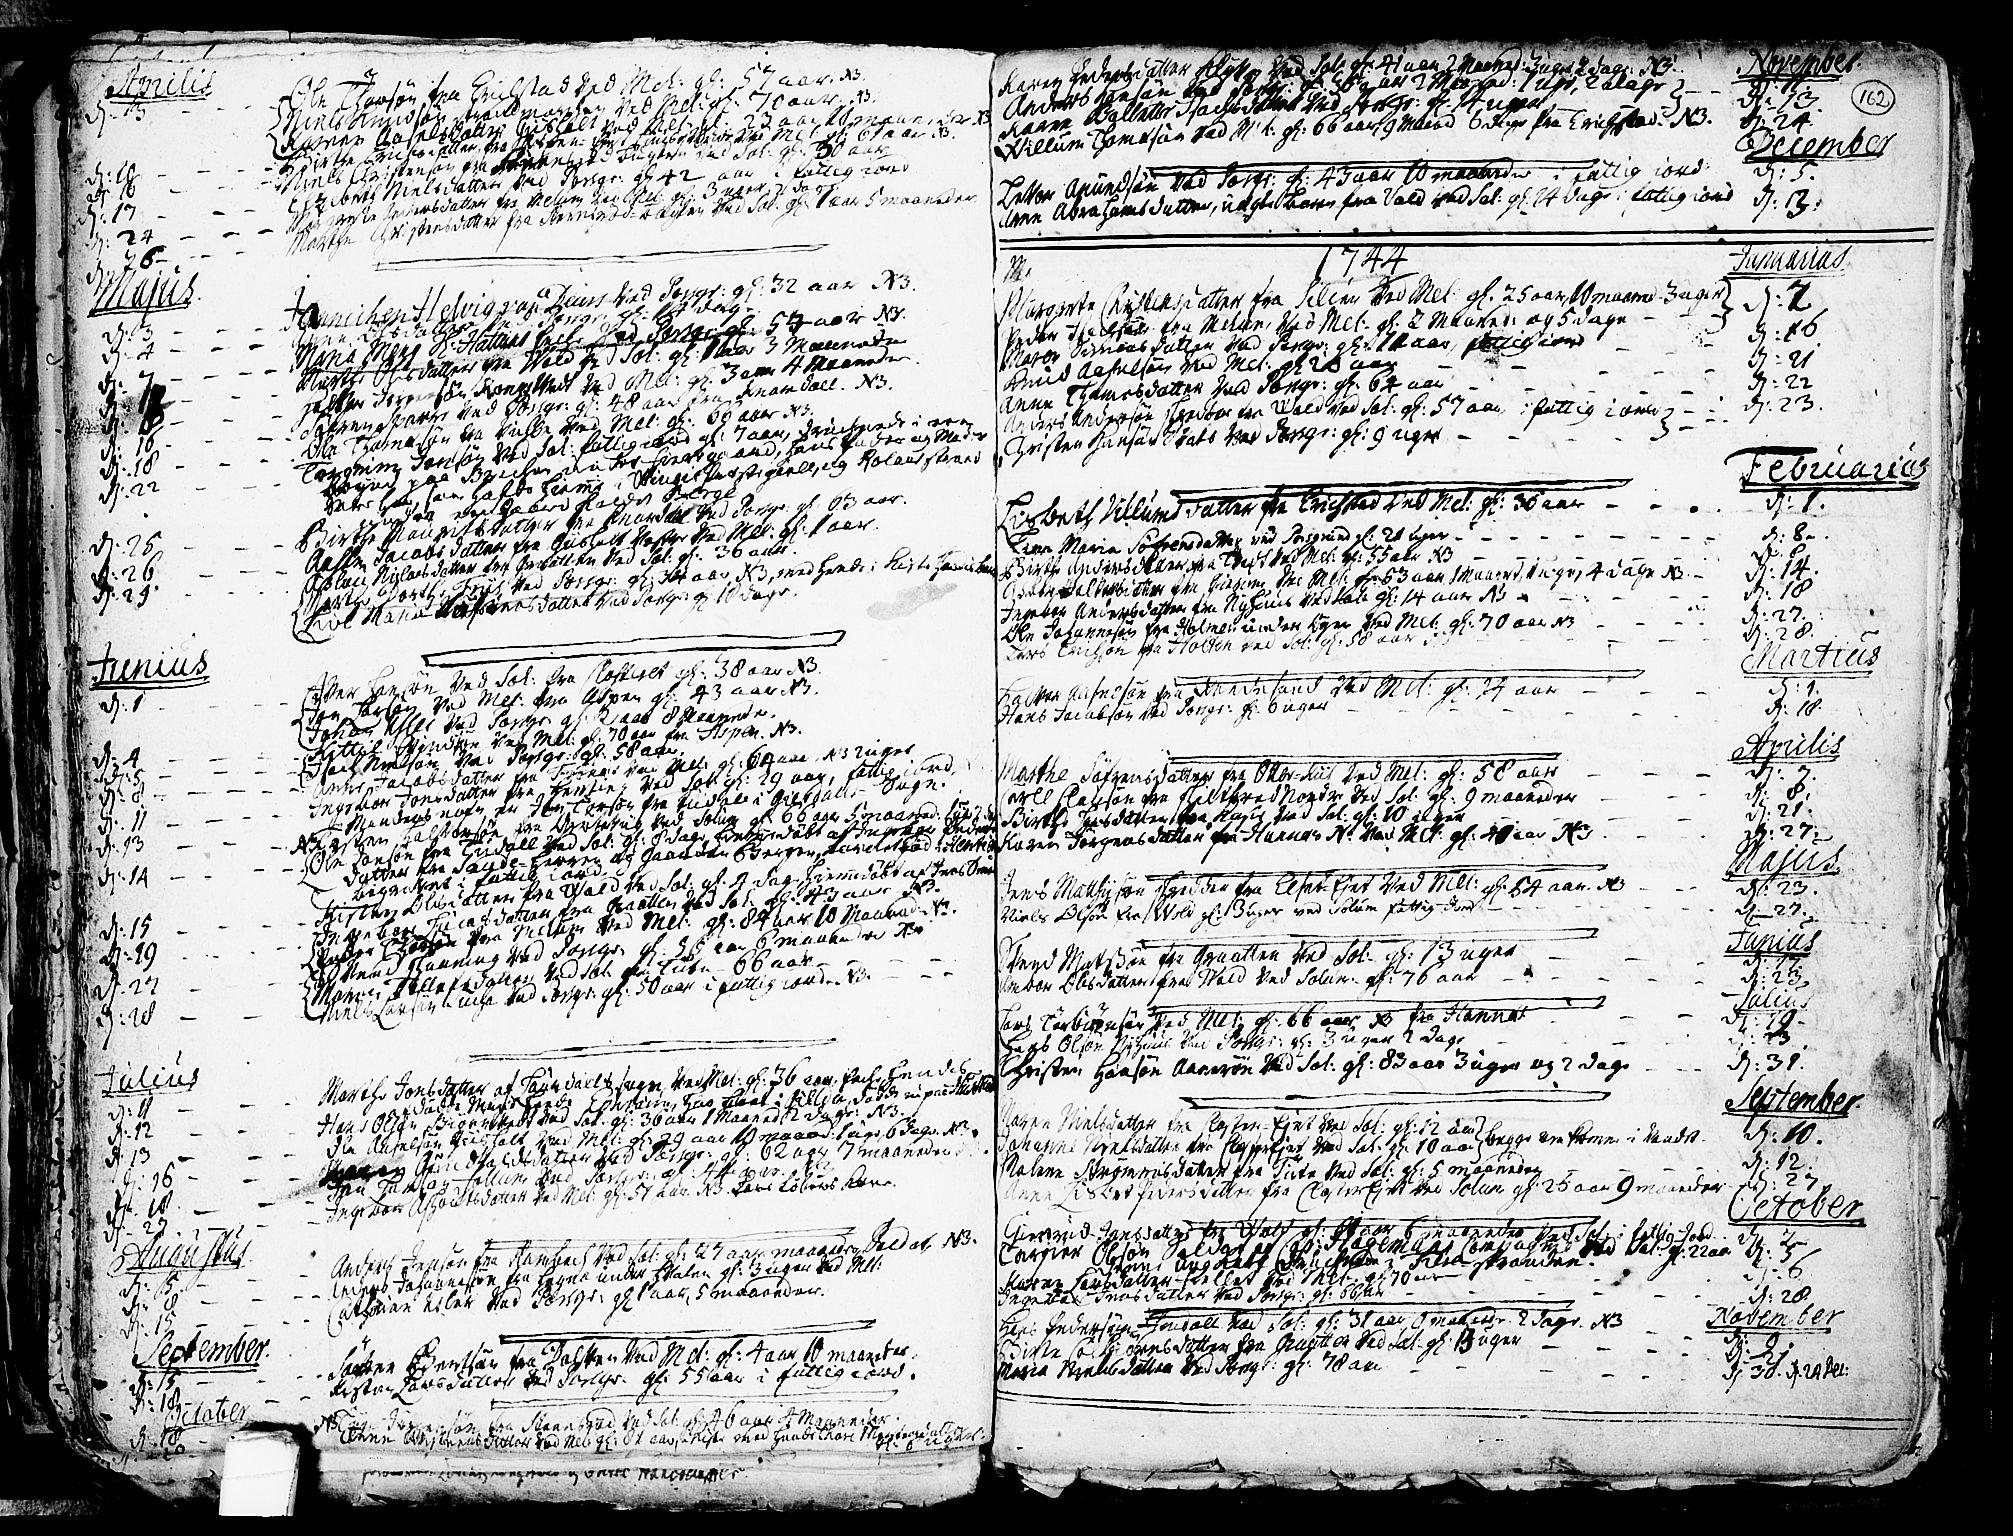 SAKO, Solum kirkebøker, F/Fa/L0002: Ministerialbok nr. I 2, 1713-1761, s. 162